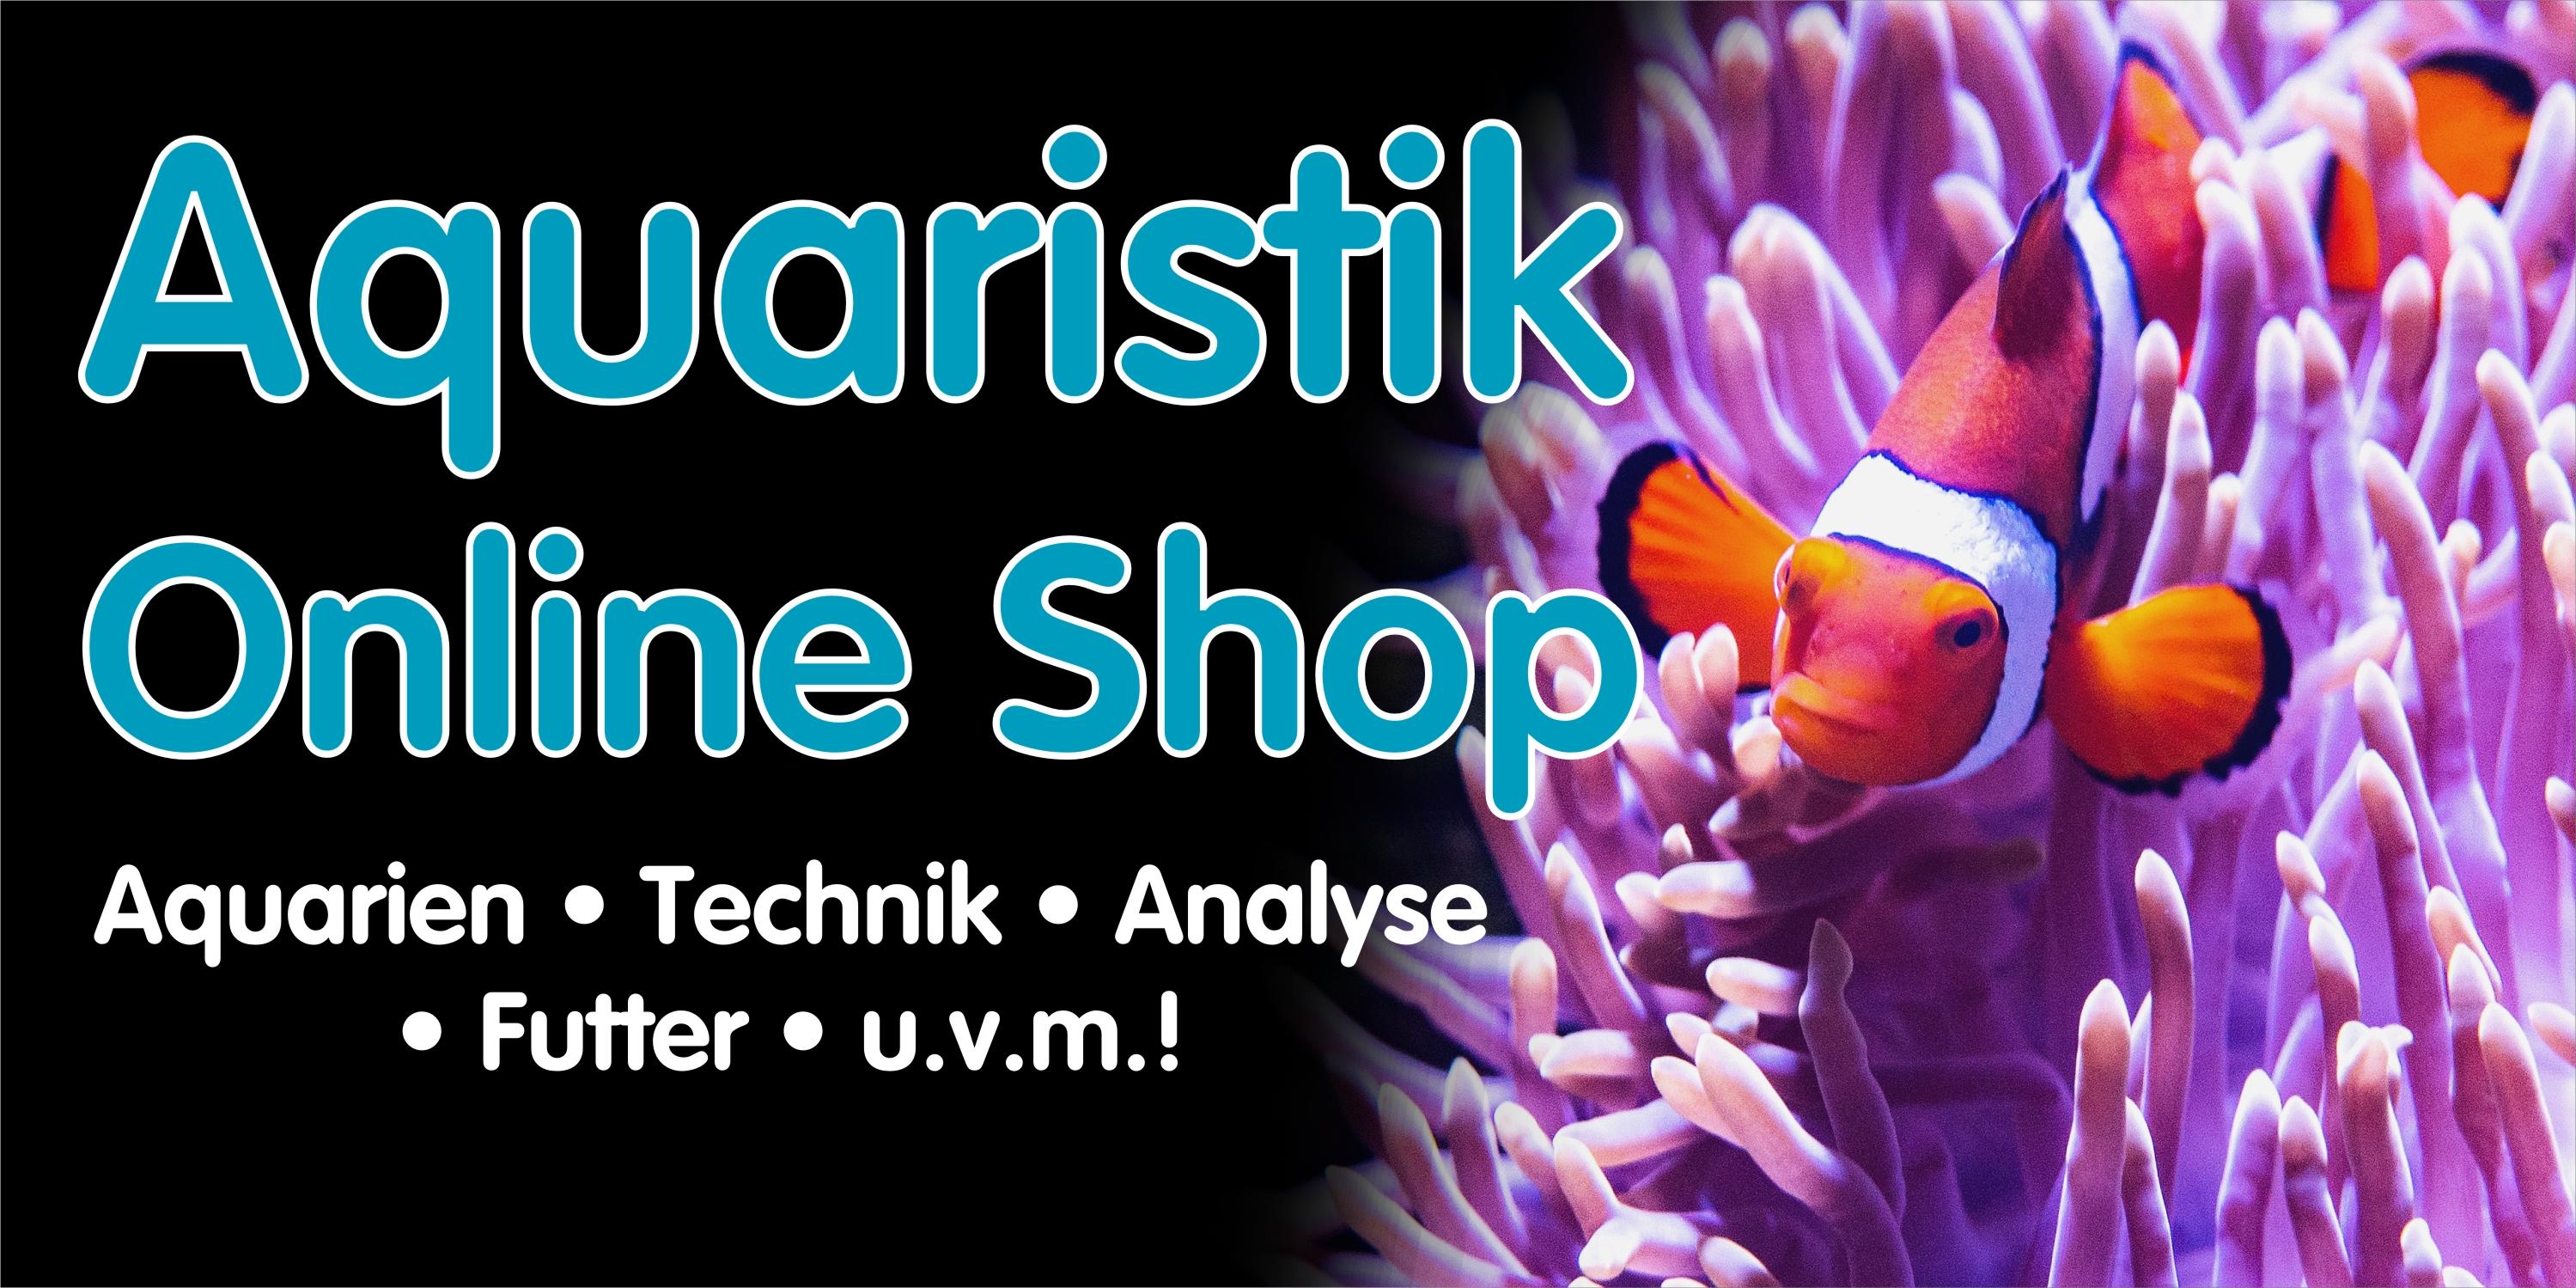 Aquaristik online shop megazoo f r tiere das gr te for Teichfische hannover